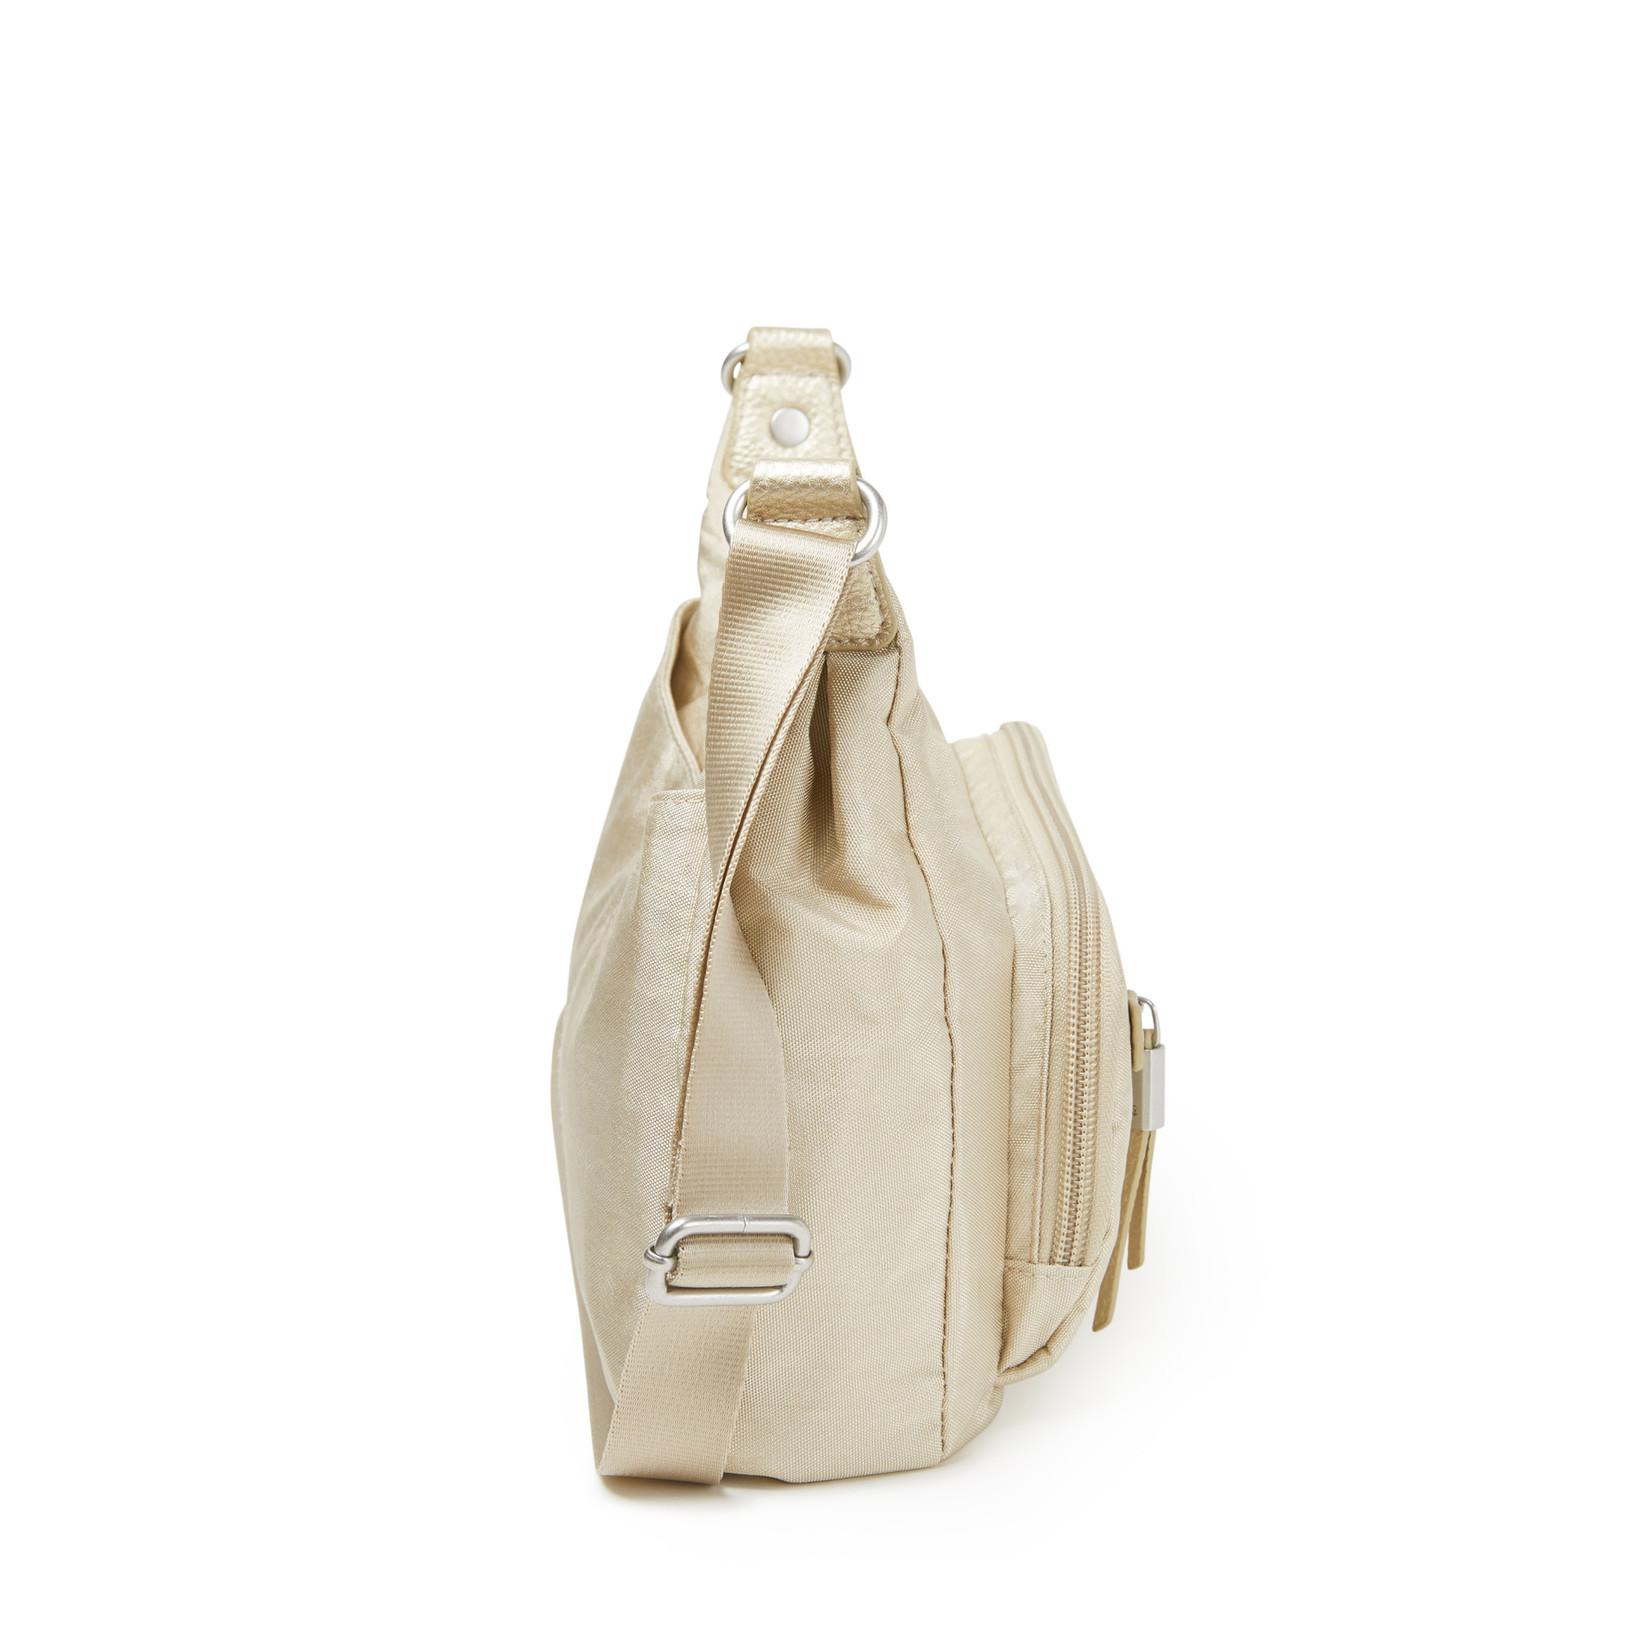 Baggallini RFID Everyday Traveler Bagg - Champagne Shimmer